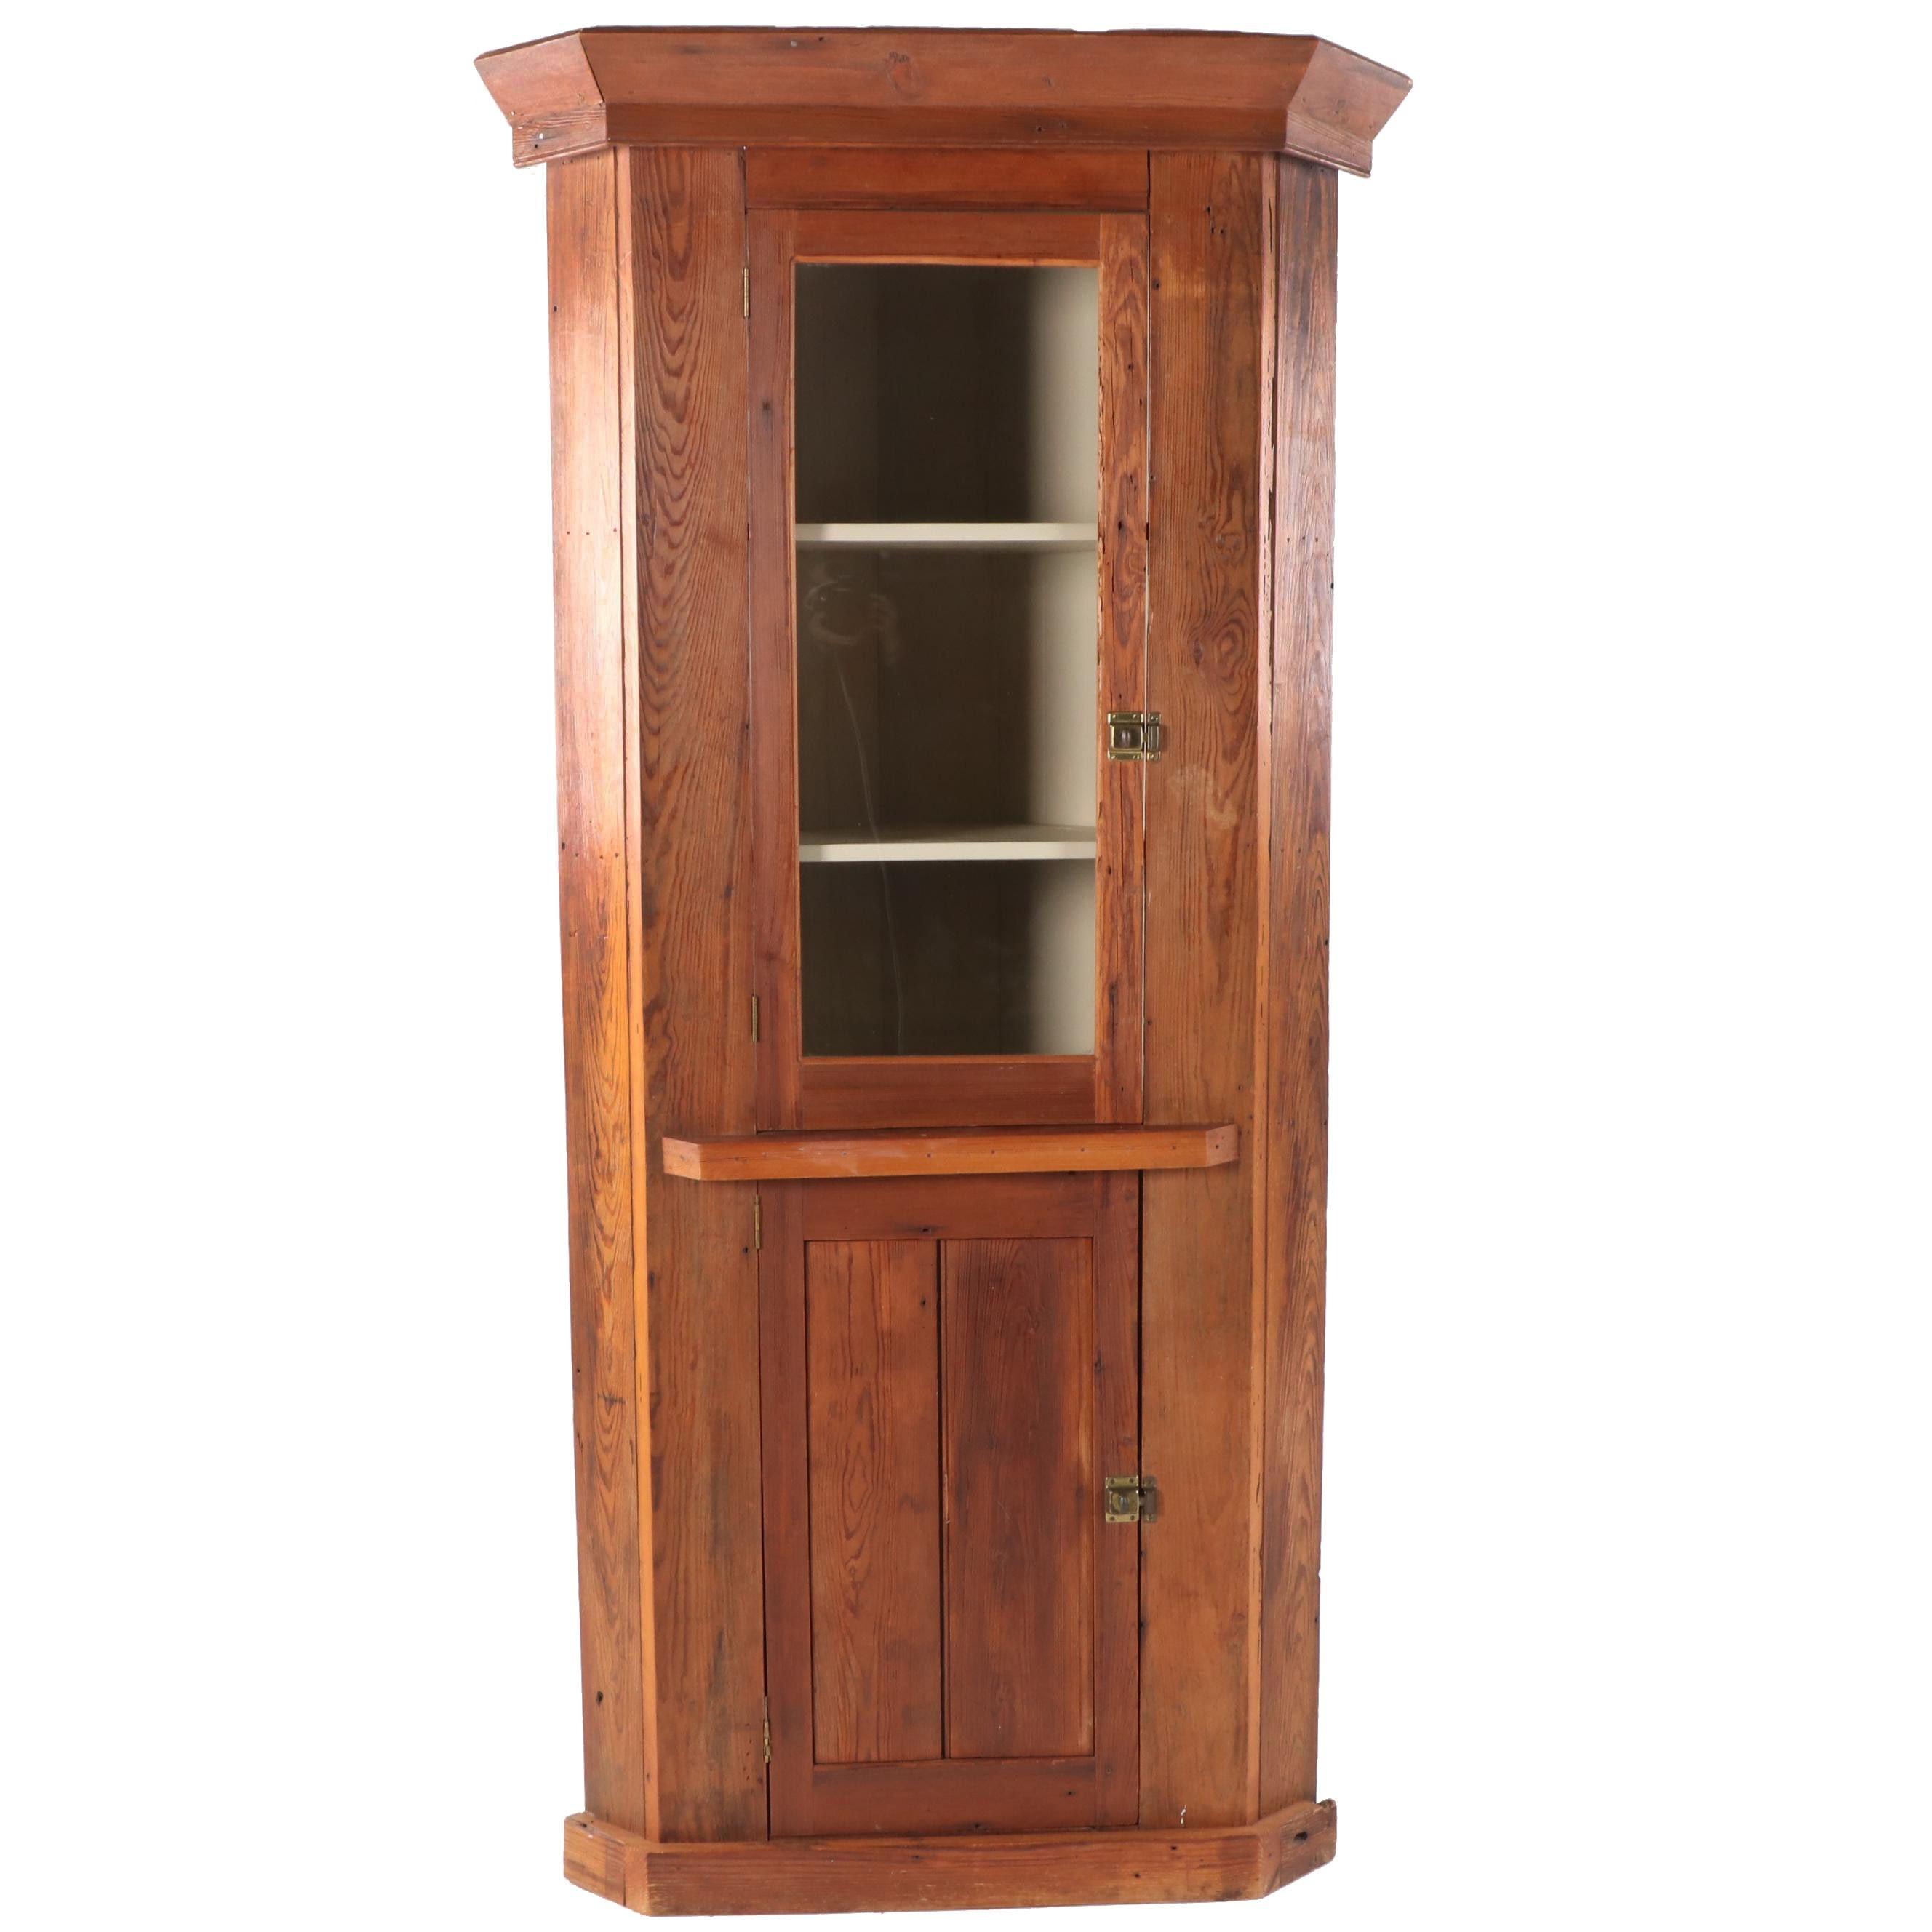 Repurposed Pine Corner Cabinet, Early 20th Century